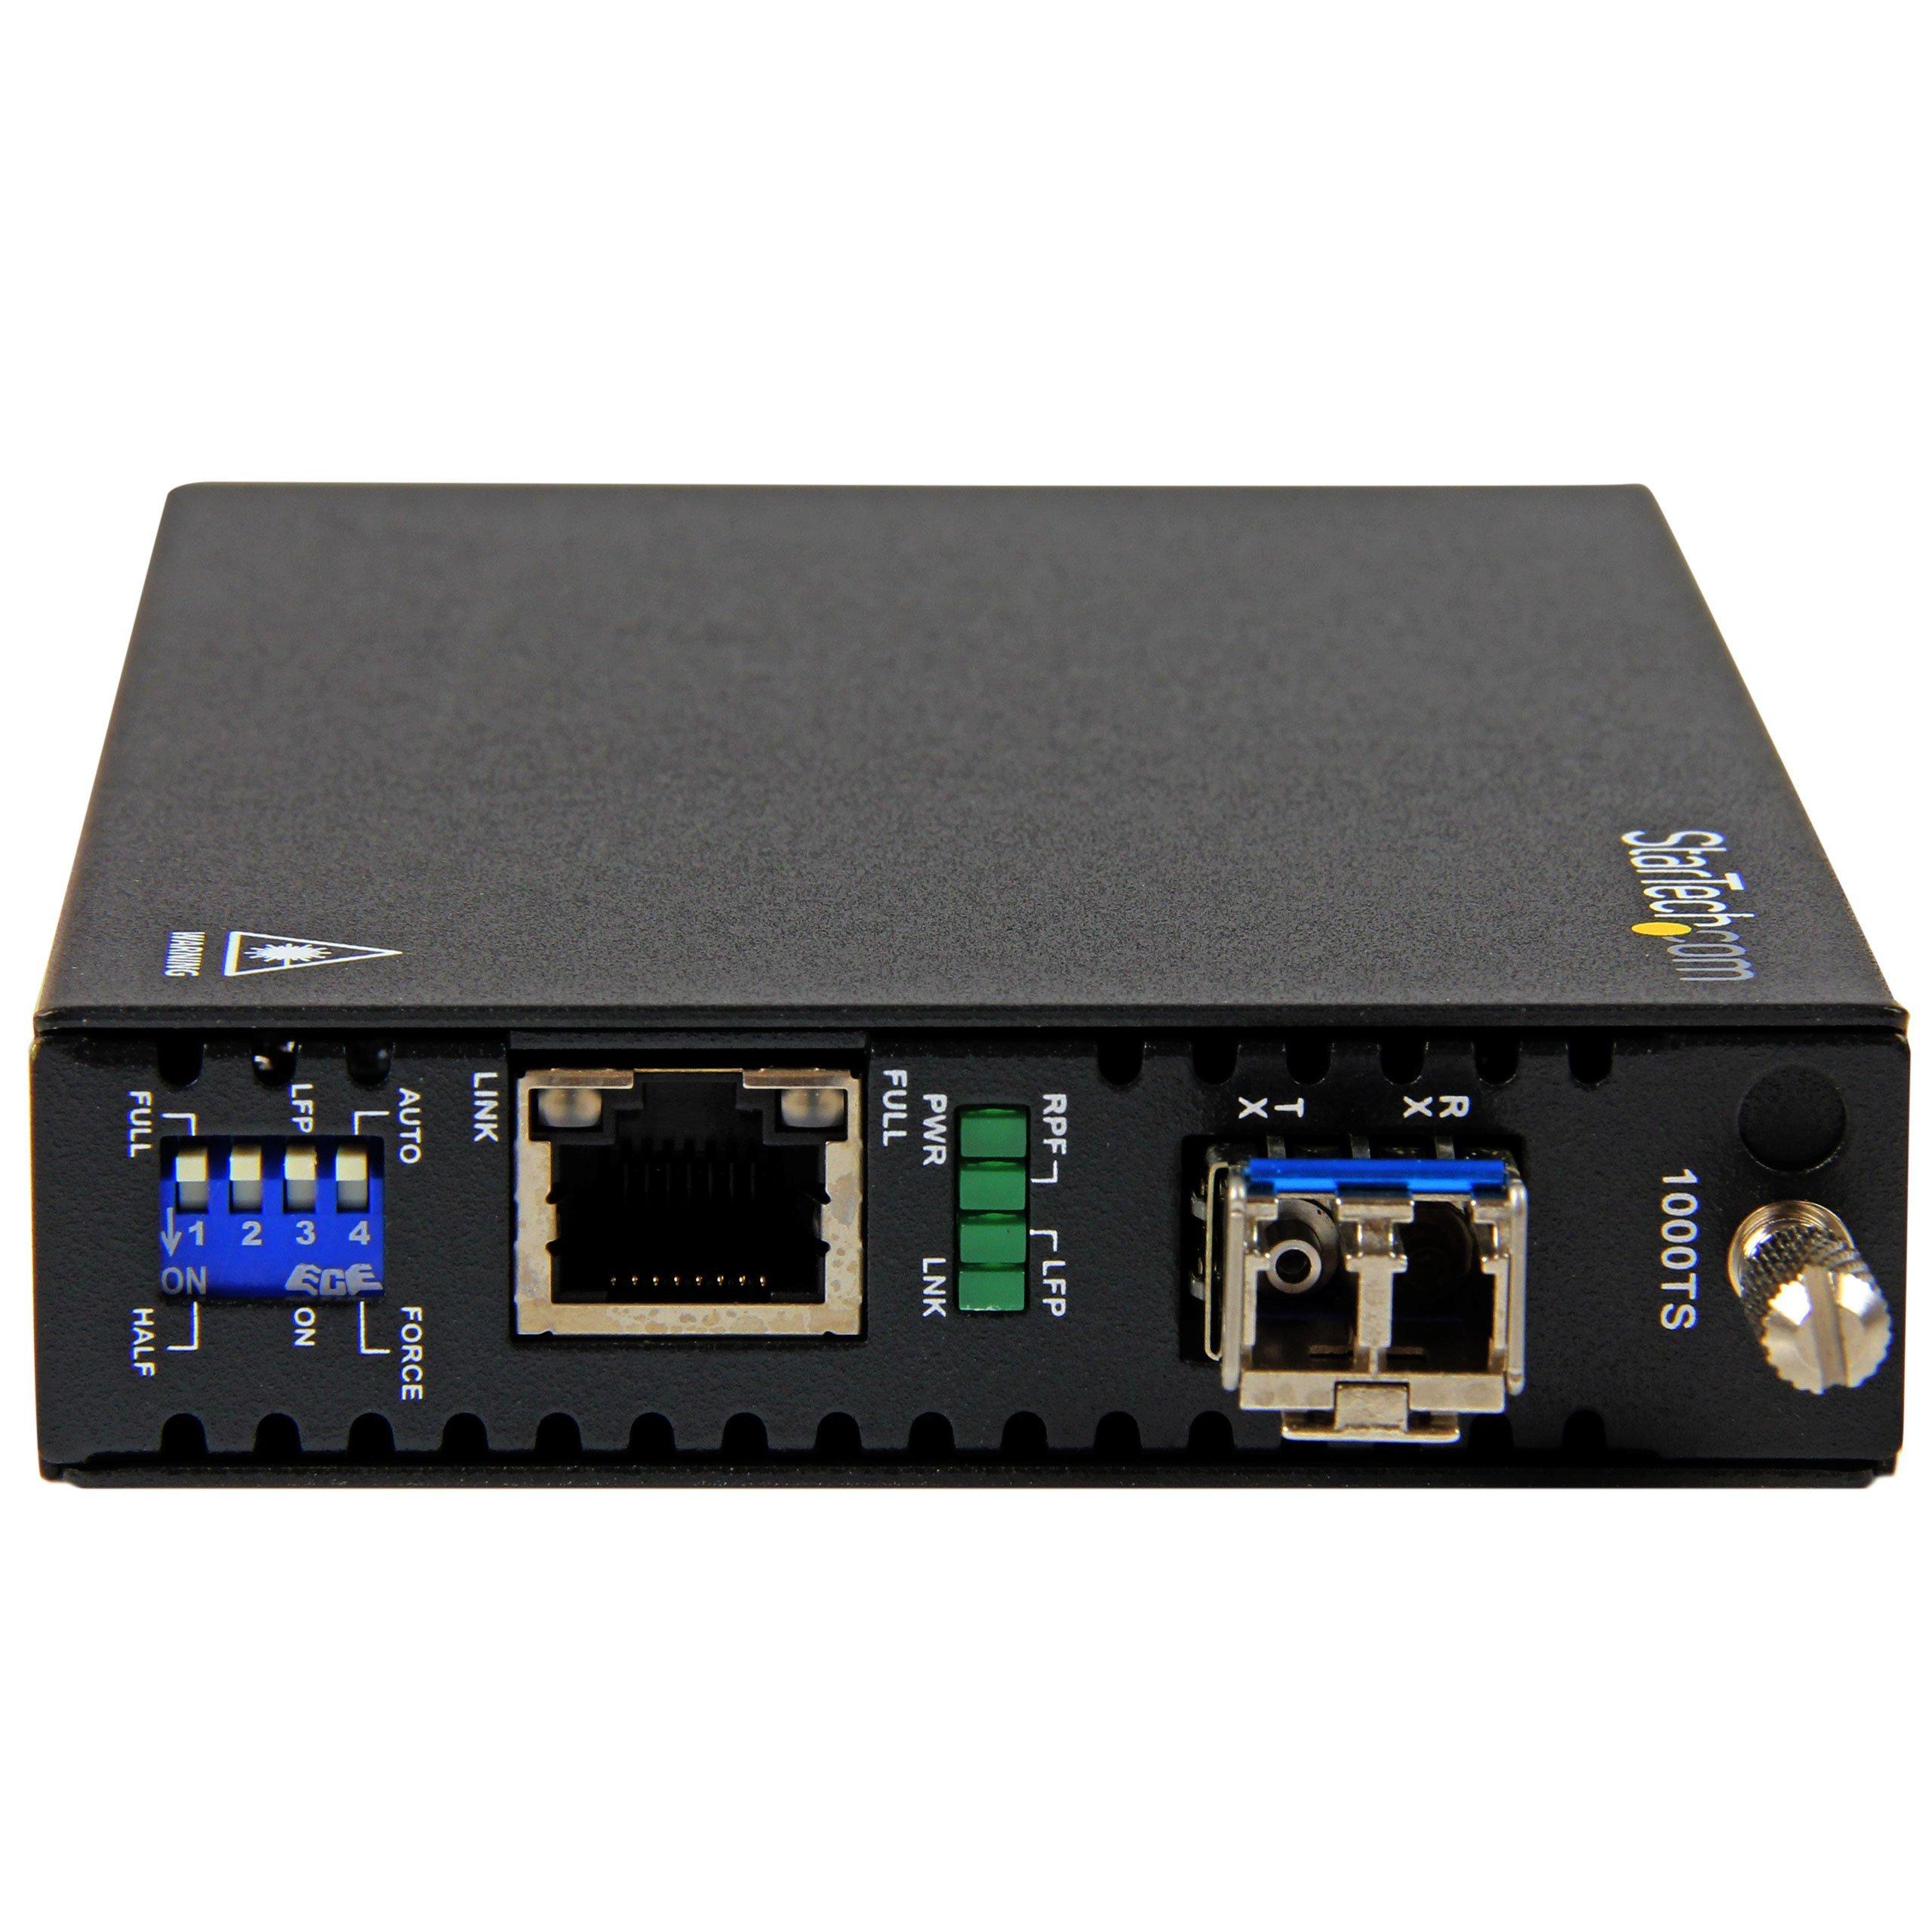 StarTech.com Gigabit Ethernet Copper-to-Fiber Media Converter - SM LC - 10 km ET91000SM10 by StarTech (Image #2)